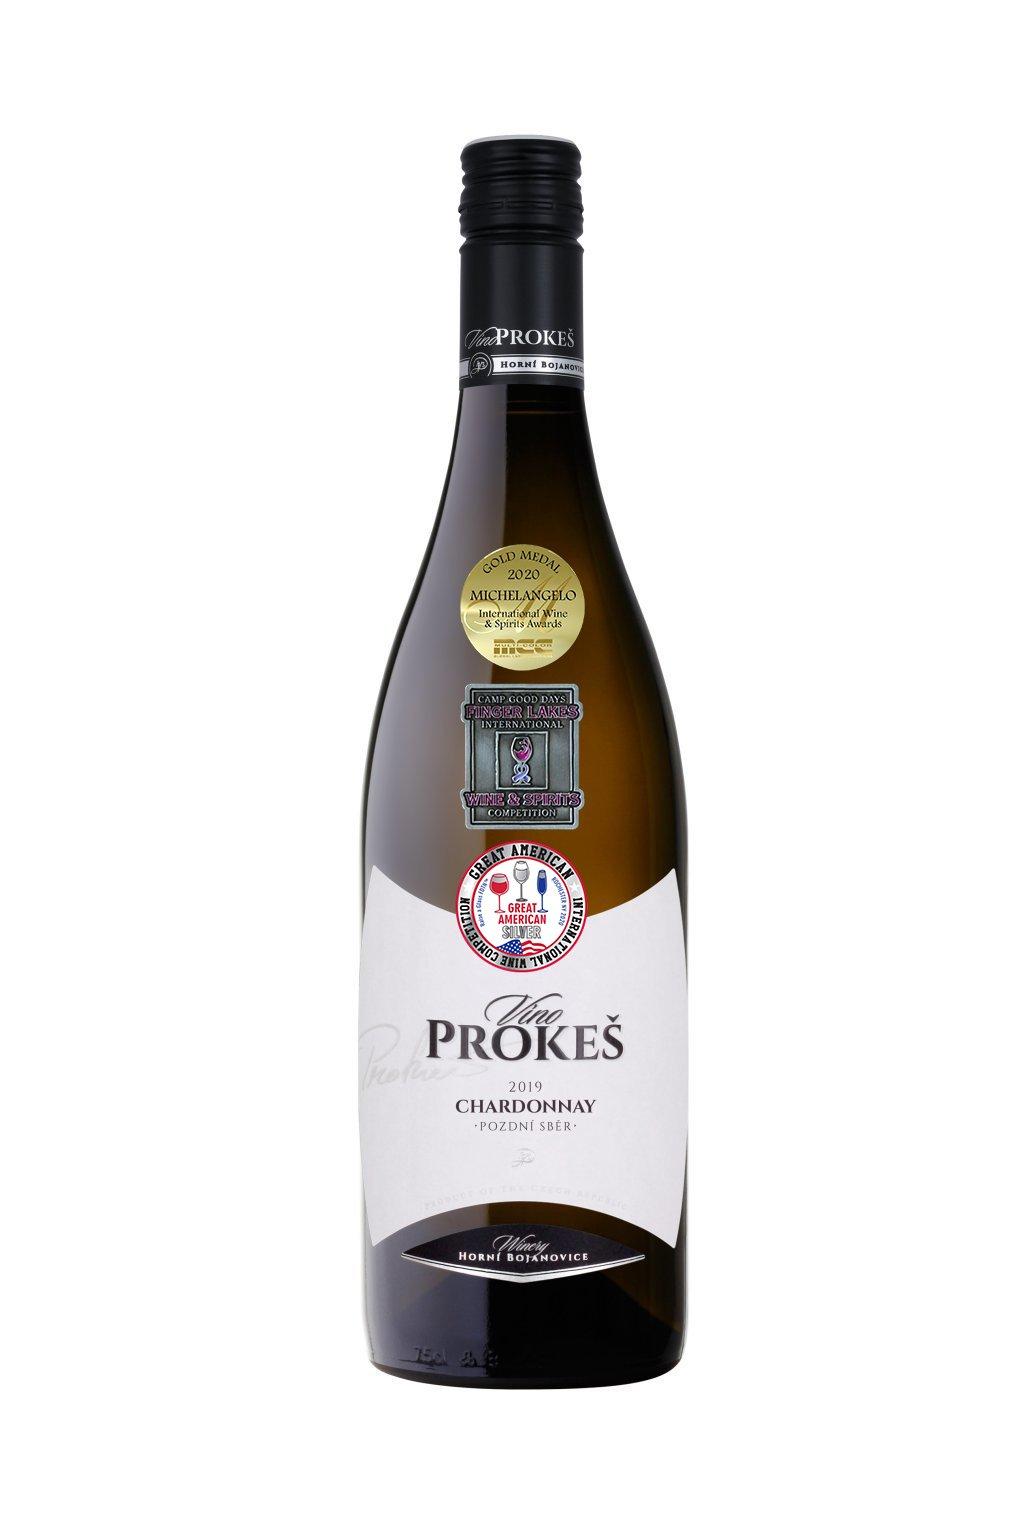 PROKES Vin Ch PS 19